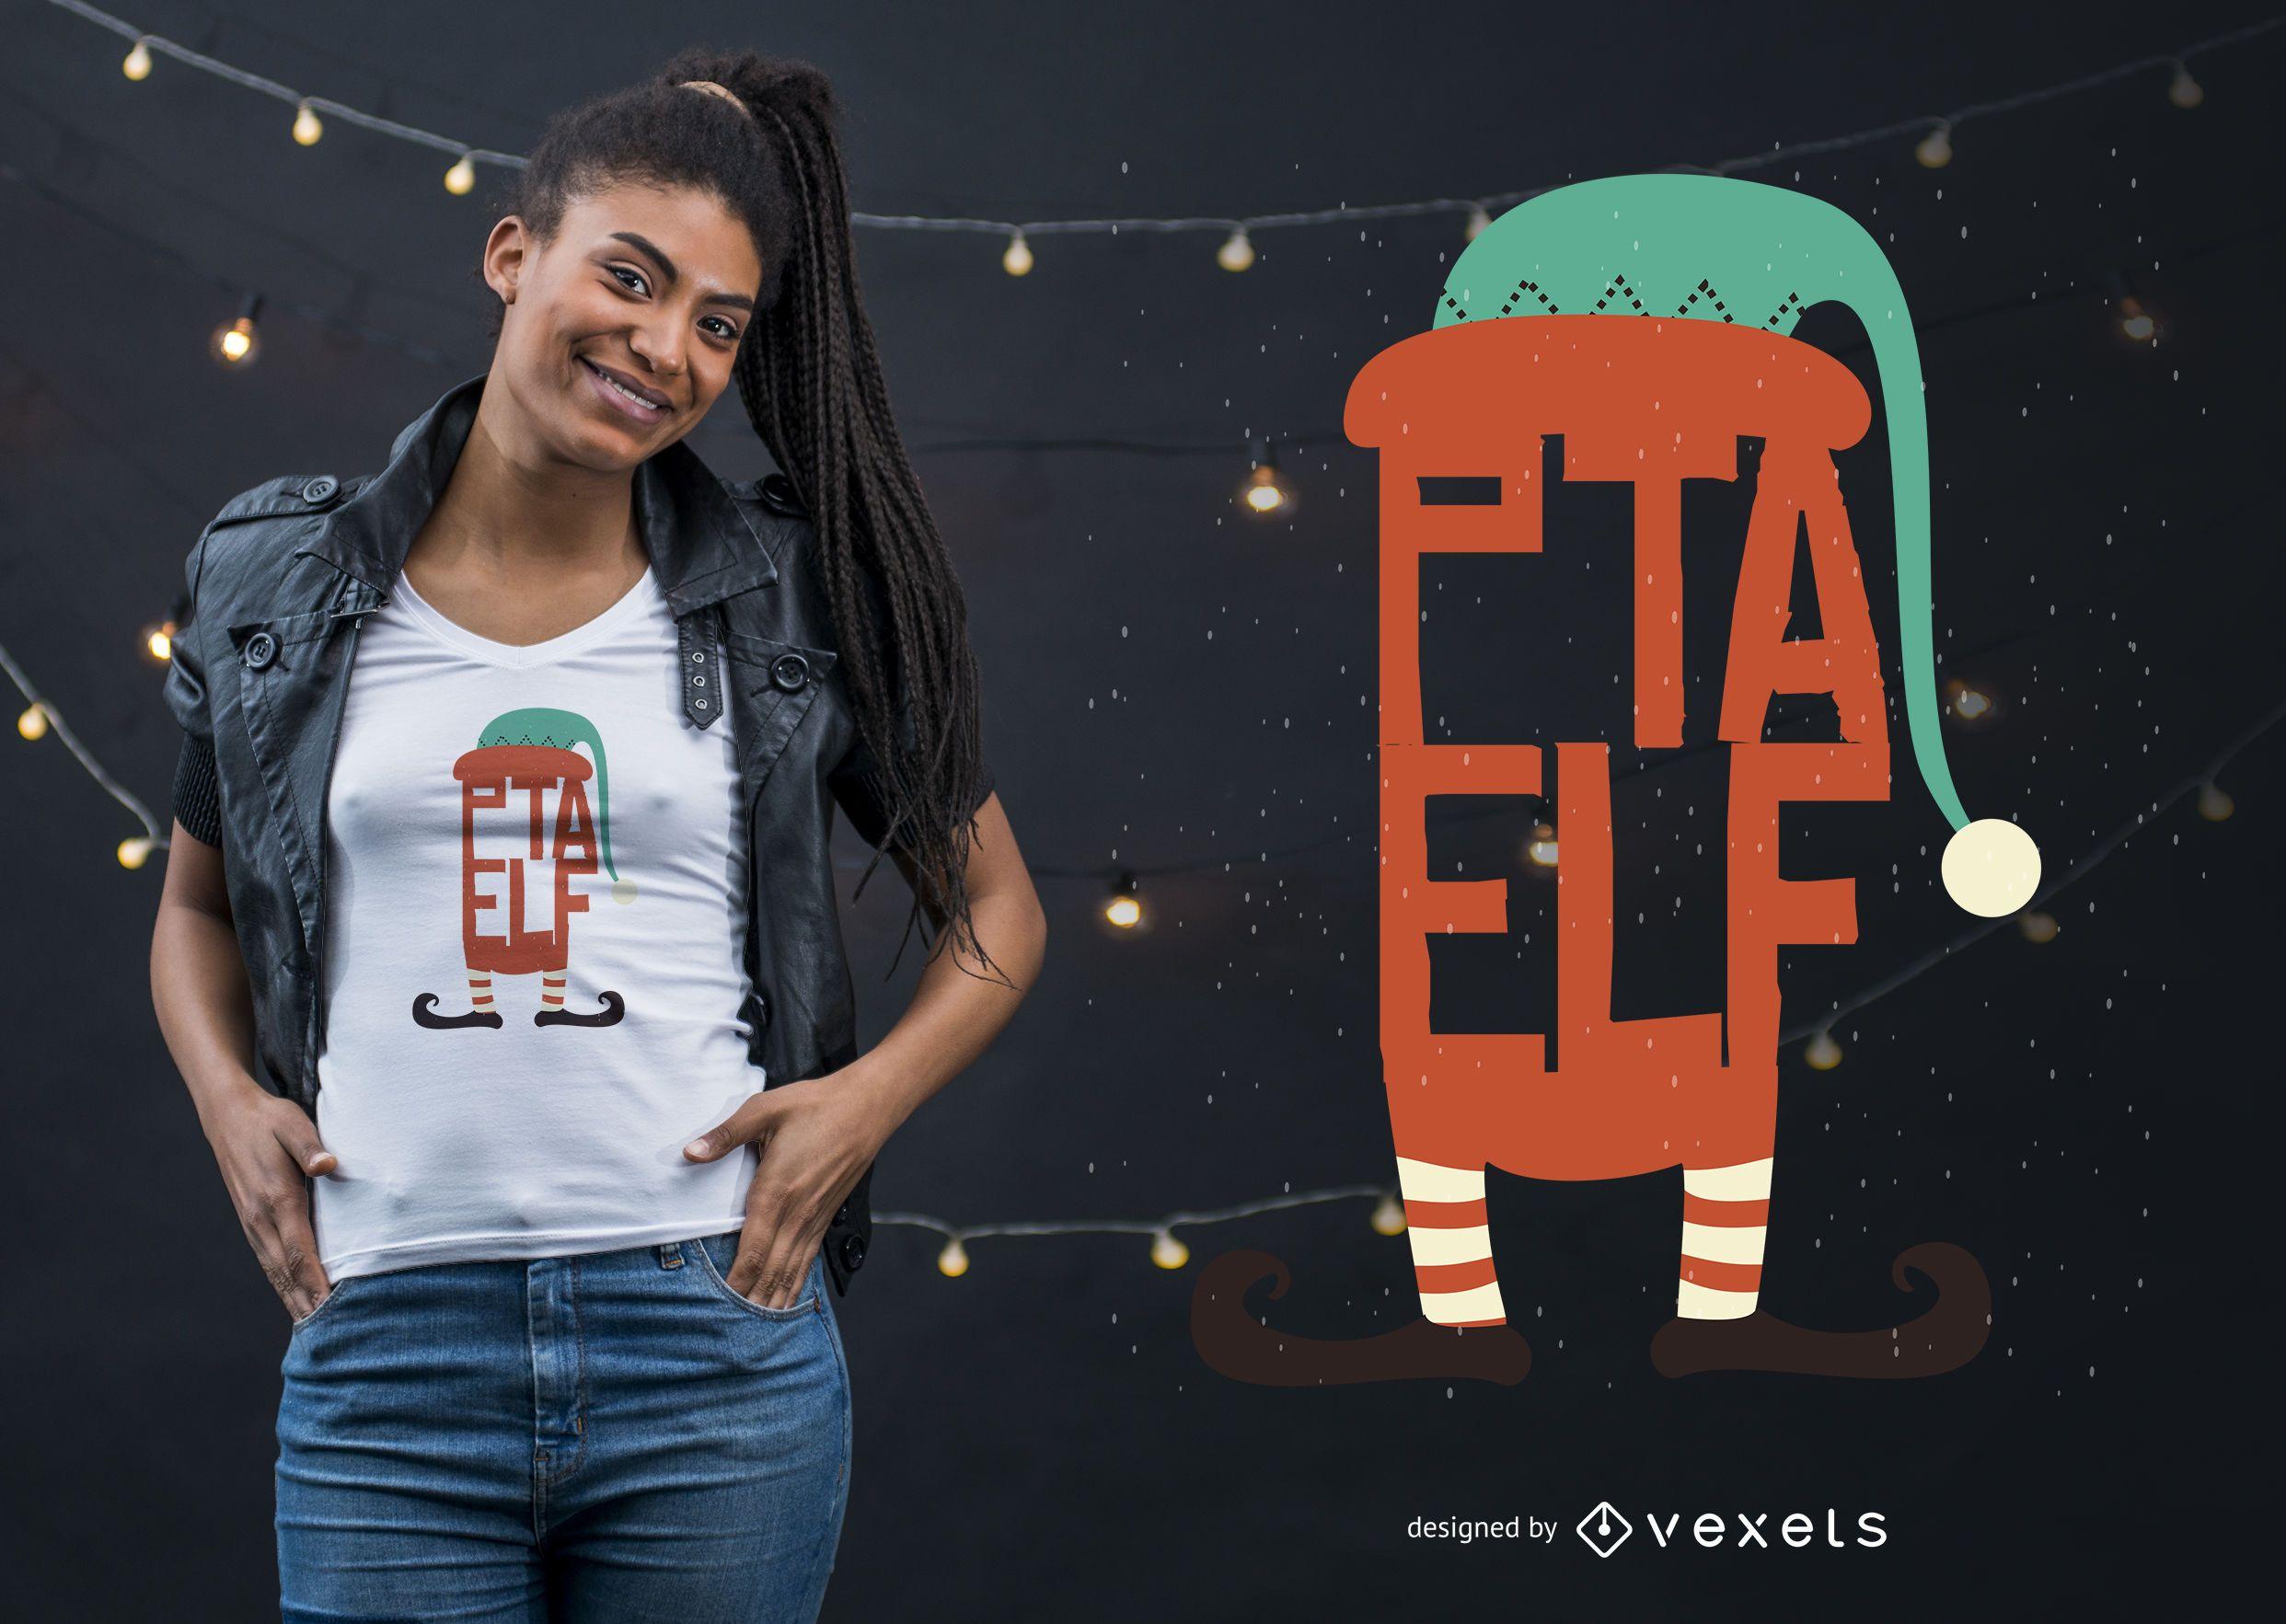 Elf PTA t-shirt design